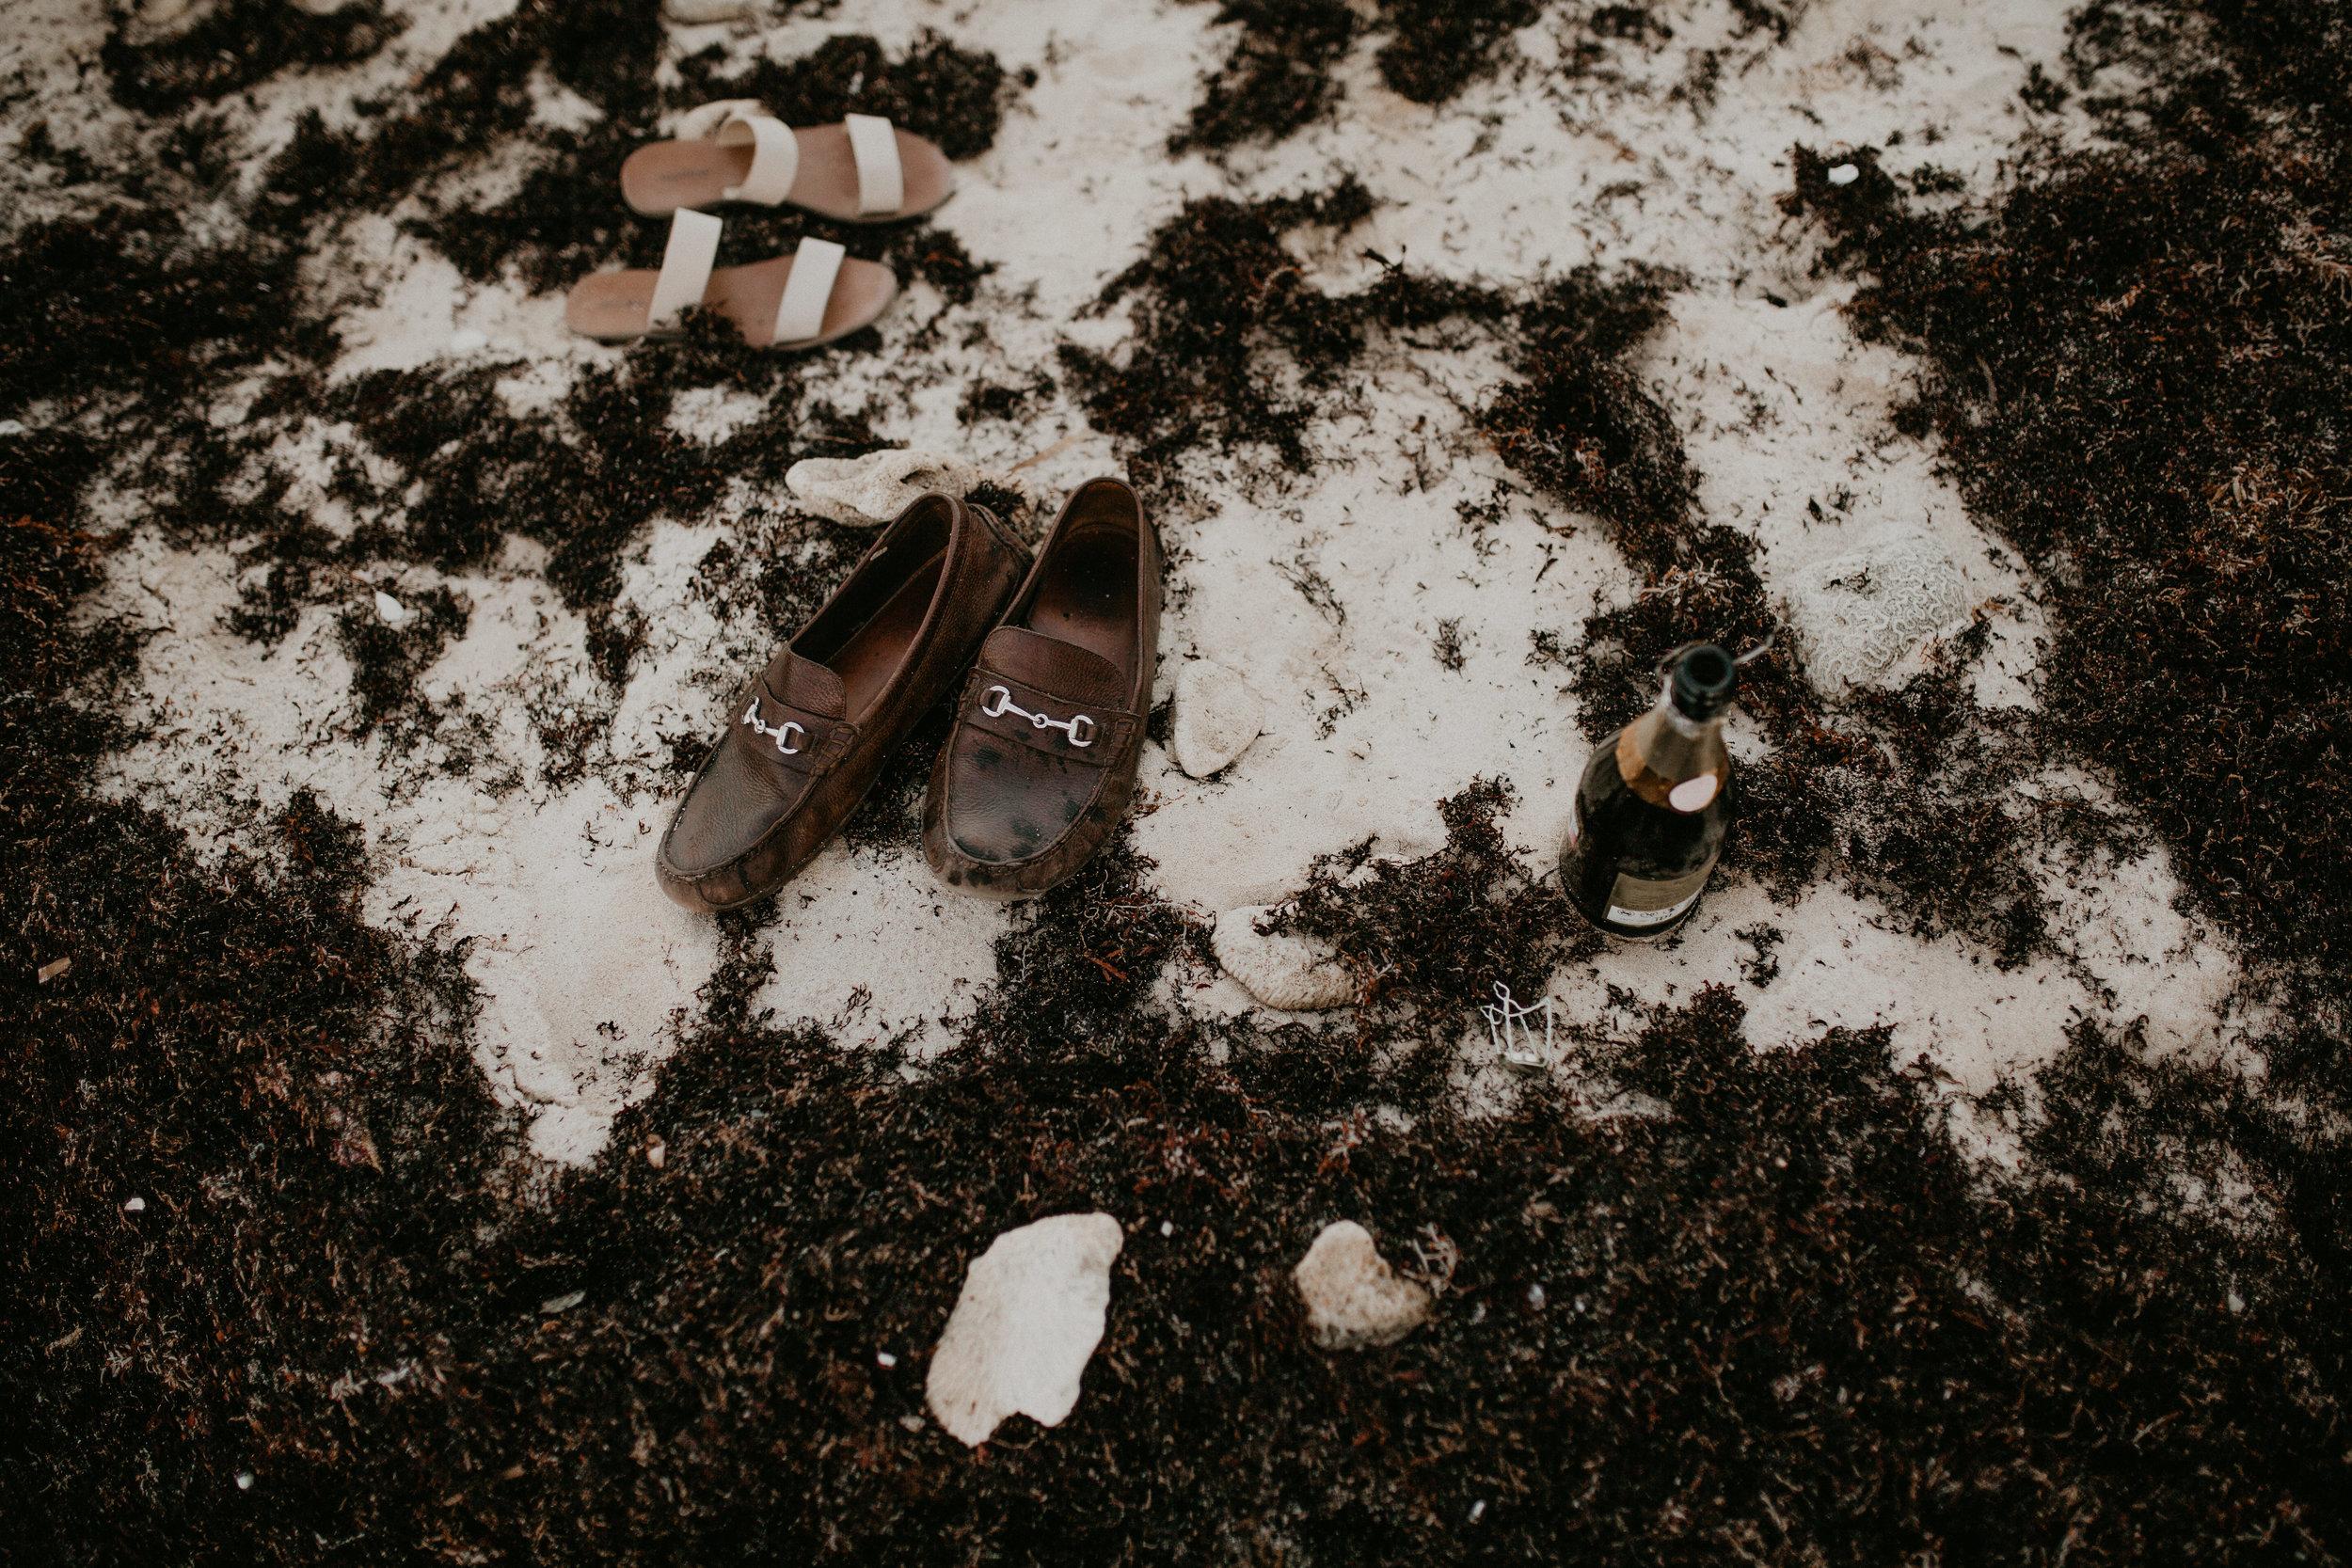 Nicole-Daacke-Photography-beachfront-akumal-destionation-wedding-tulum-mexico-elopement-photographer-destination-wedding-inspiration-sunset-champagne-pop-boho-bride-ocean-tropical-bohemian-tulum-wedding-photos-196.jpg